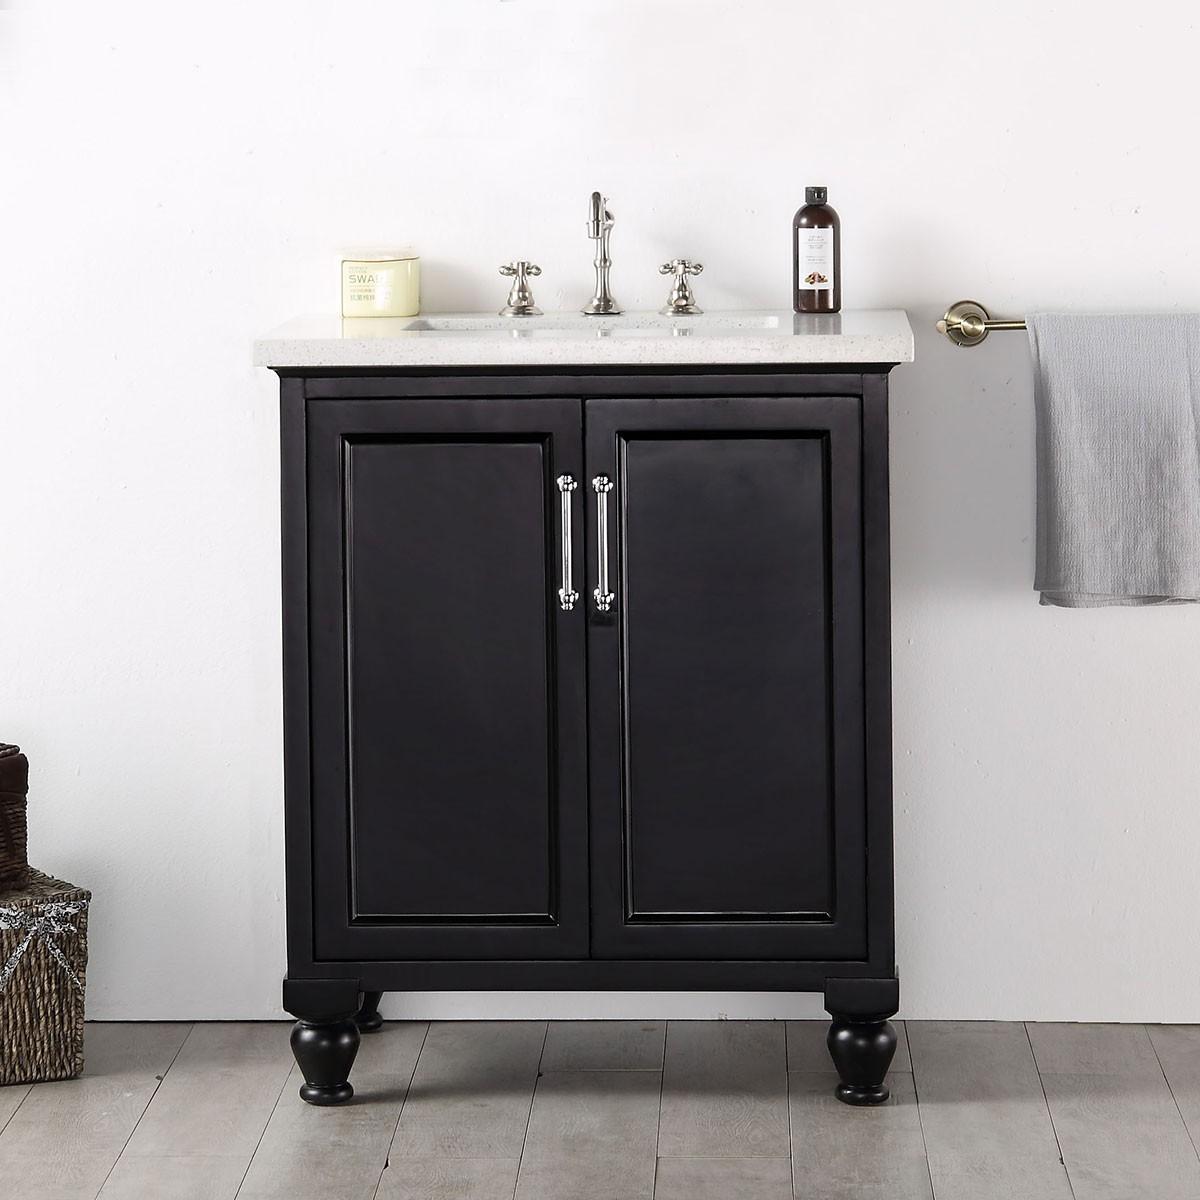 30 In Freestanding Bathroom Vanity DK6530E